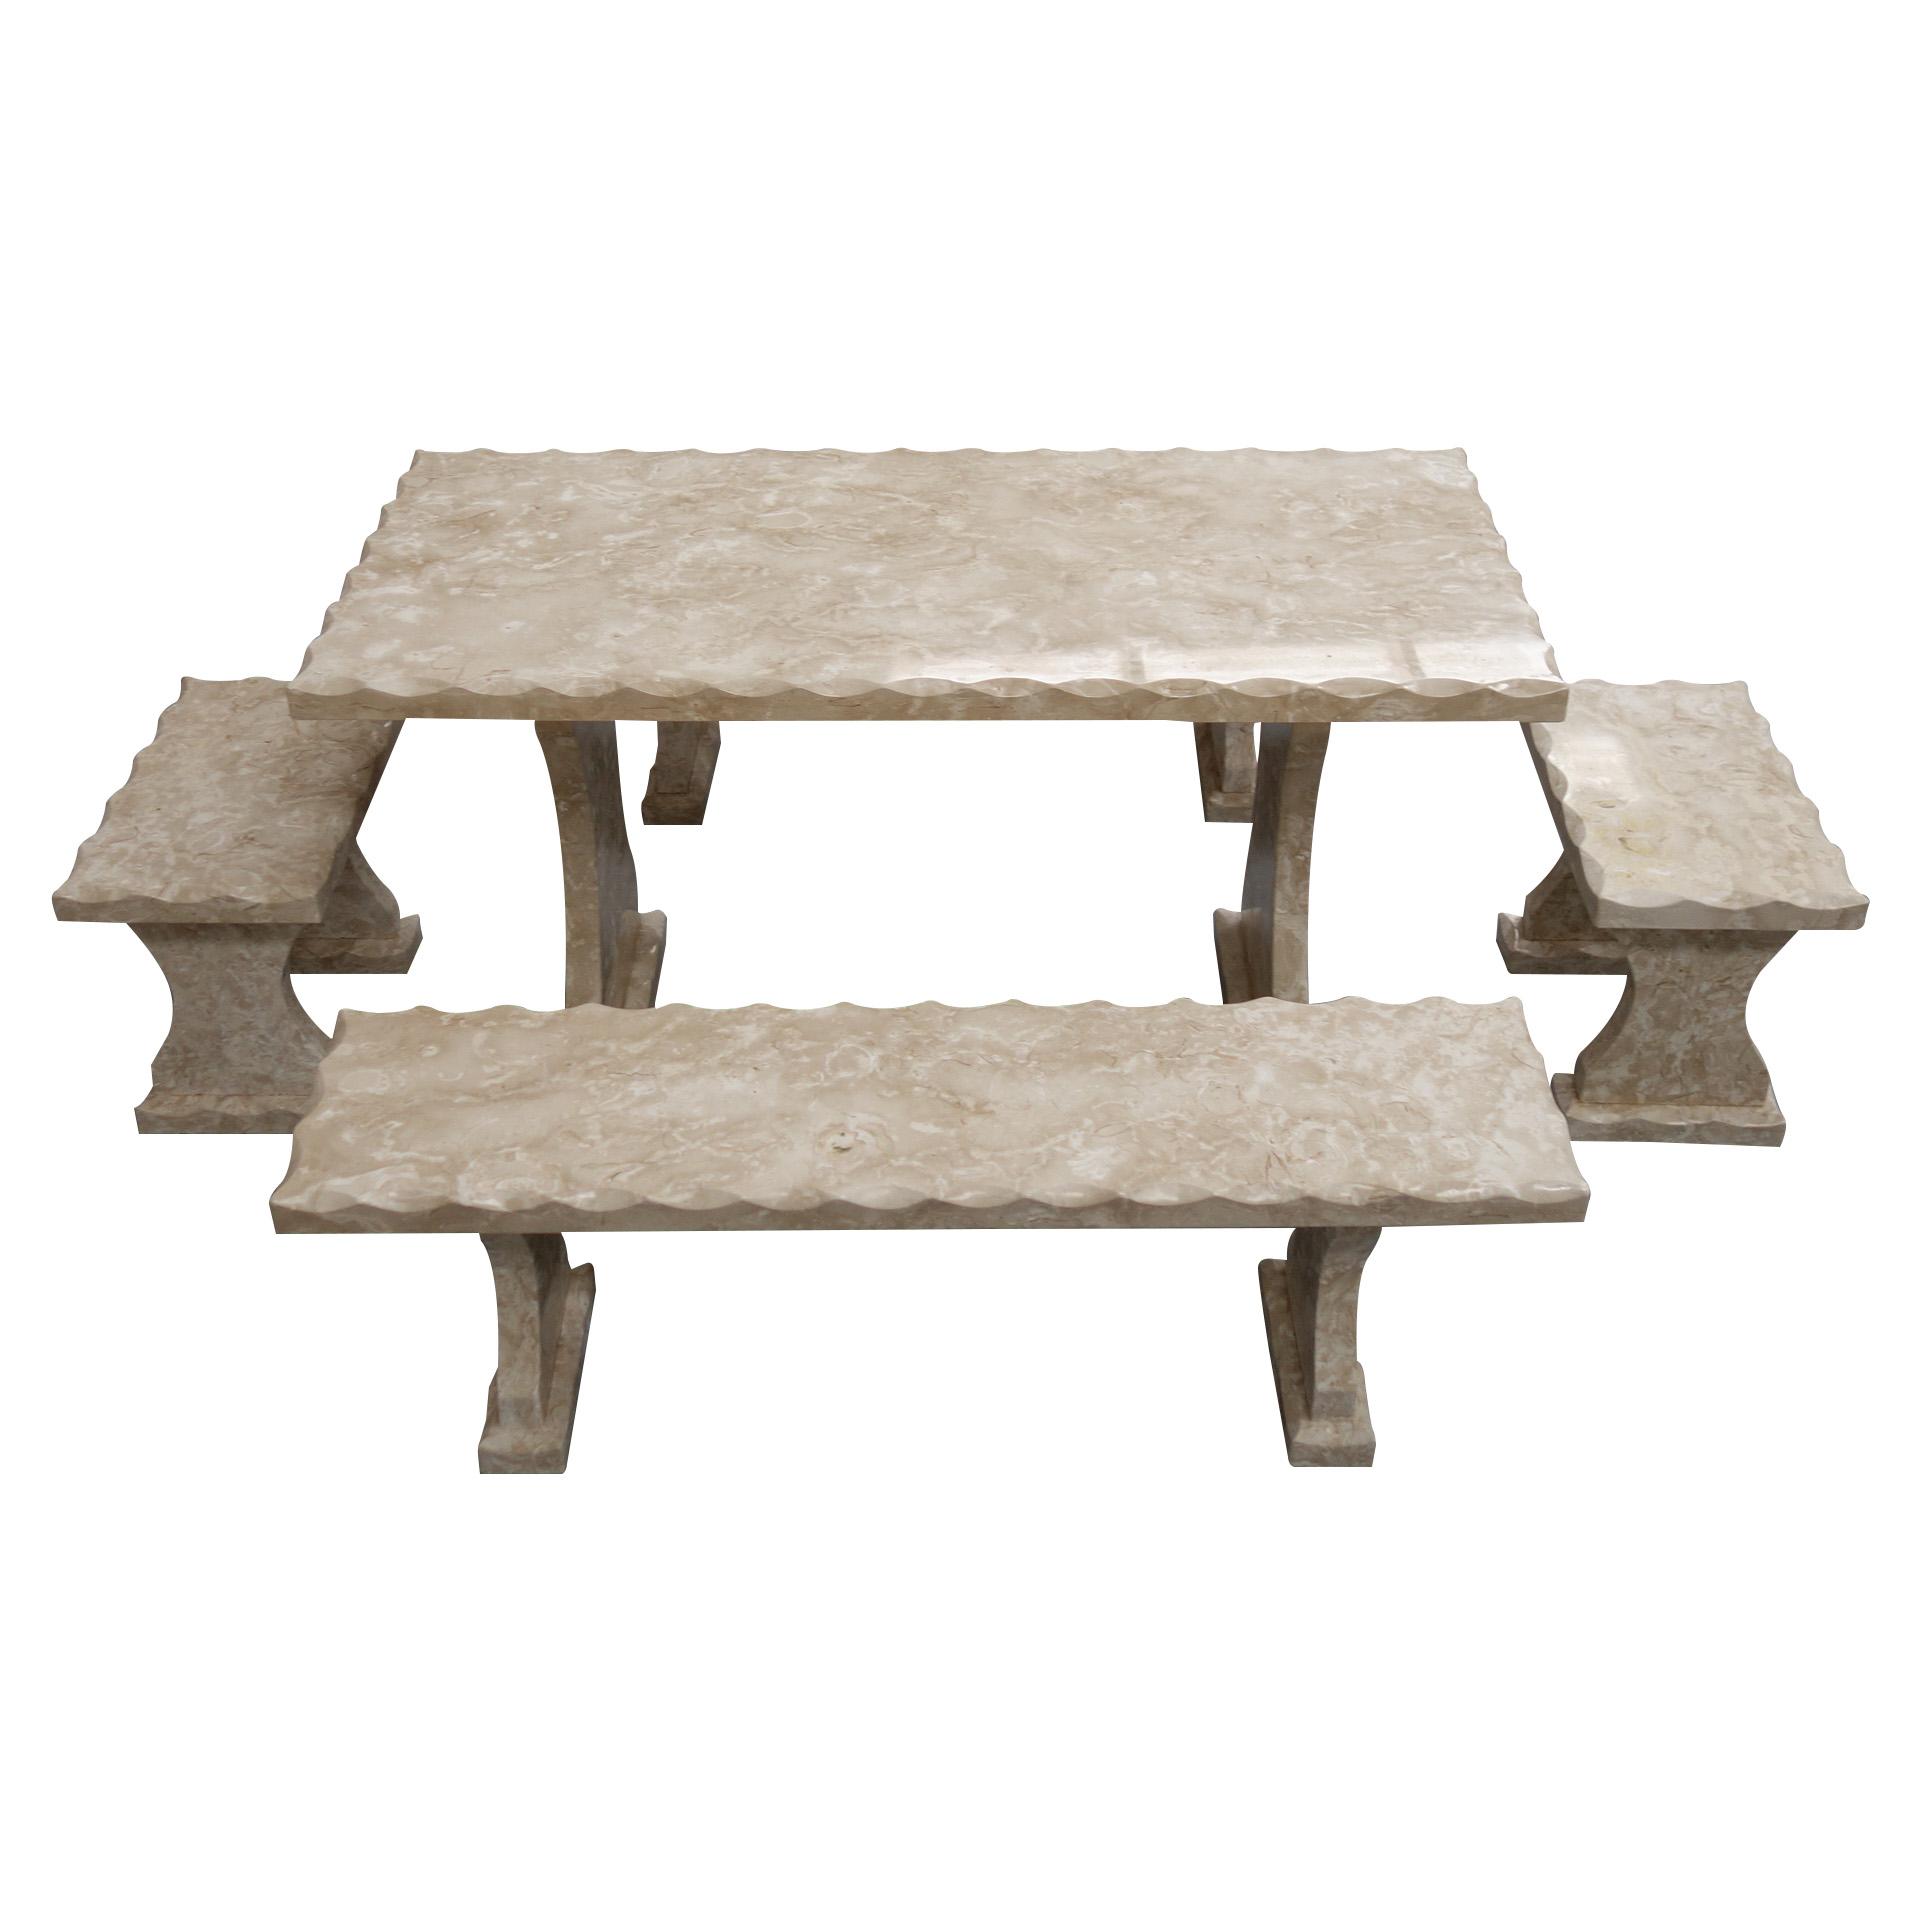 Light grey Limestone Table and 4 Bench Set TA-002